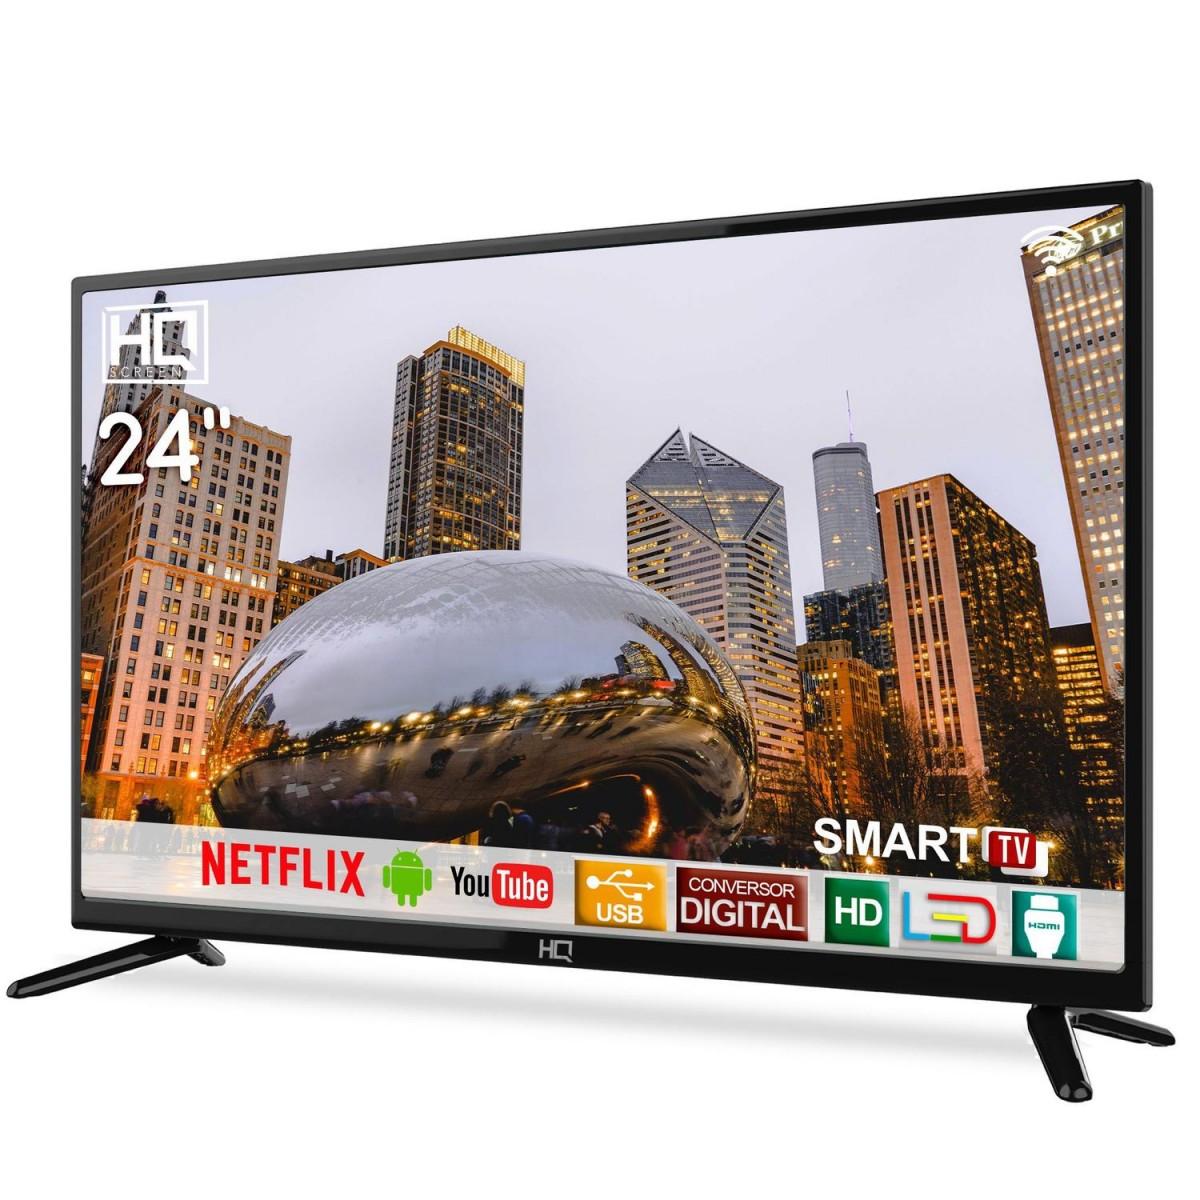 "Smart TV LED 24"" HD HQ HQSTV24NP Netflix Youtube HDMI USB Wi-Fi"